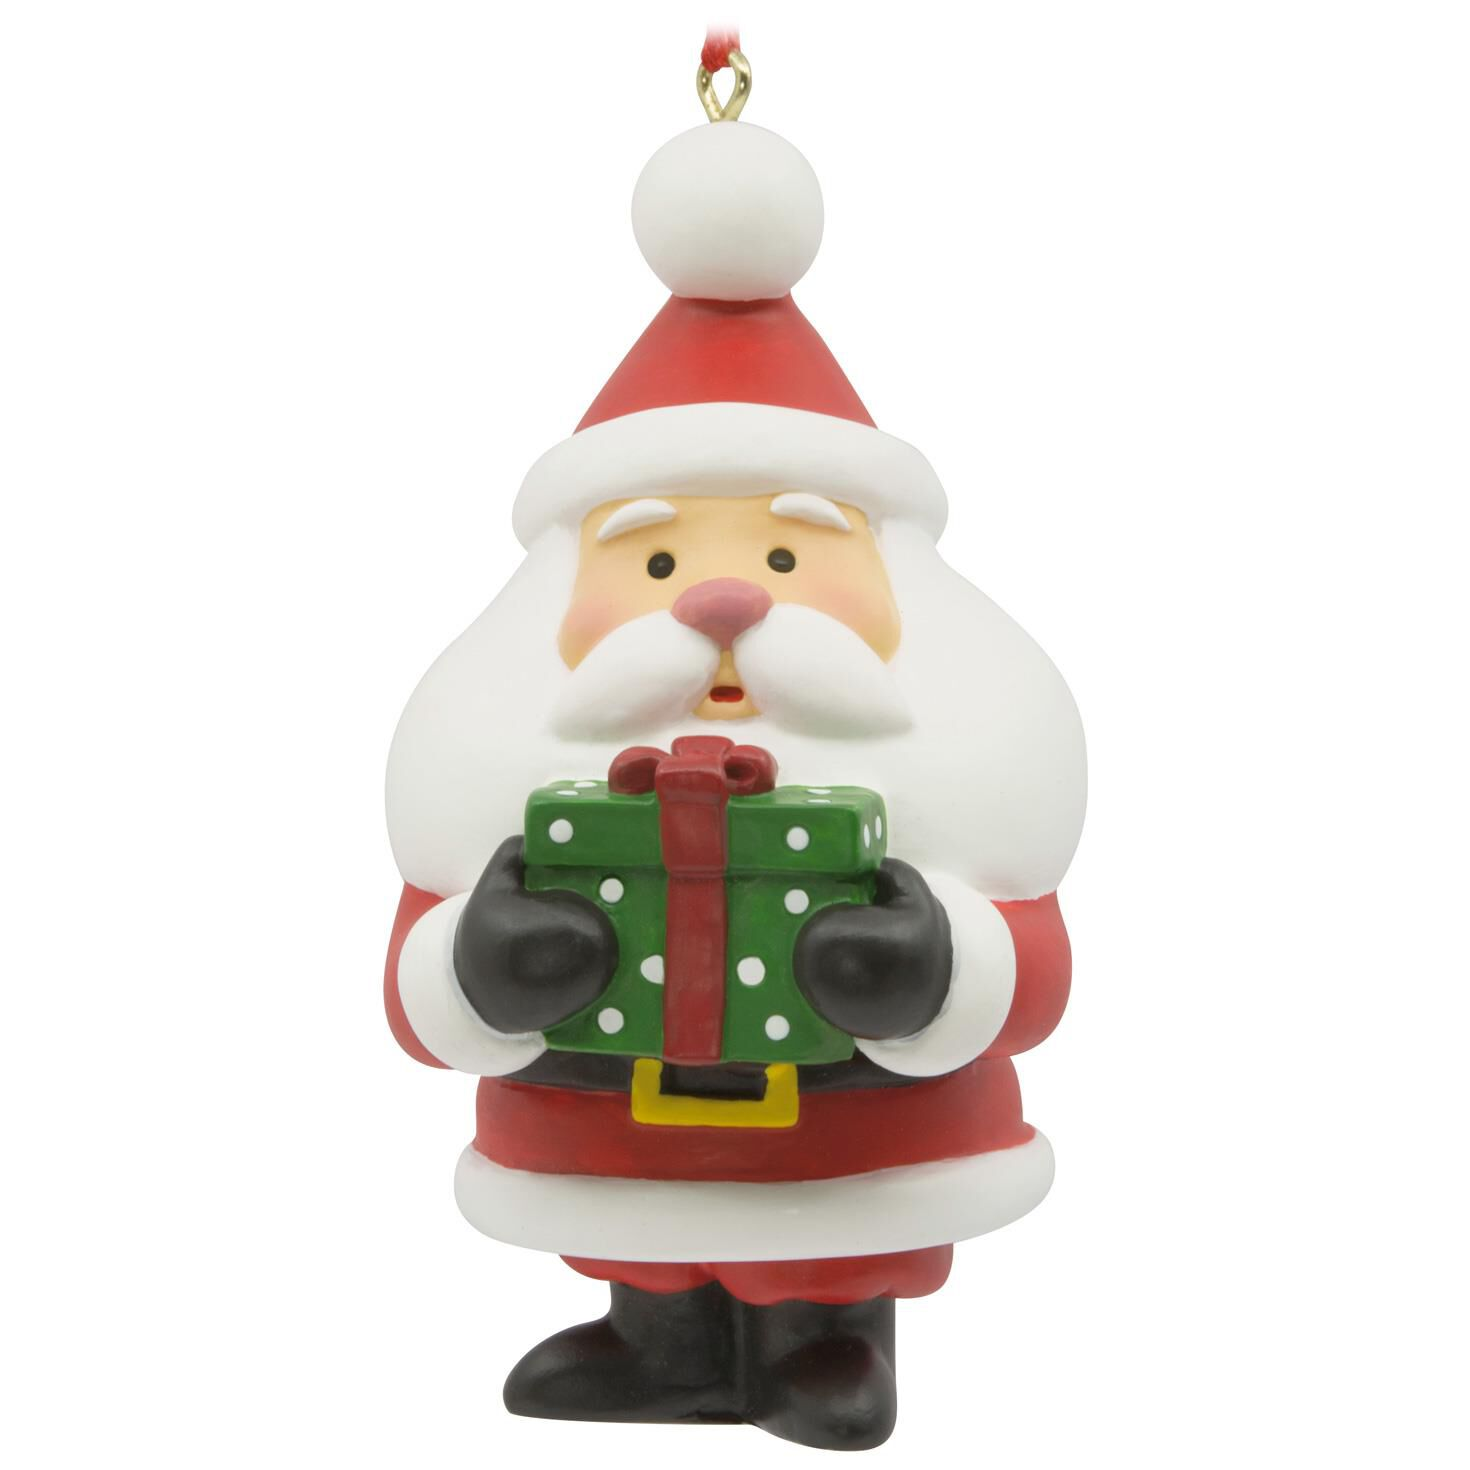 santa with present hallmark ornament gift ornaments hallmark